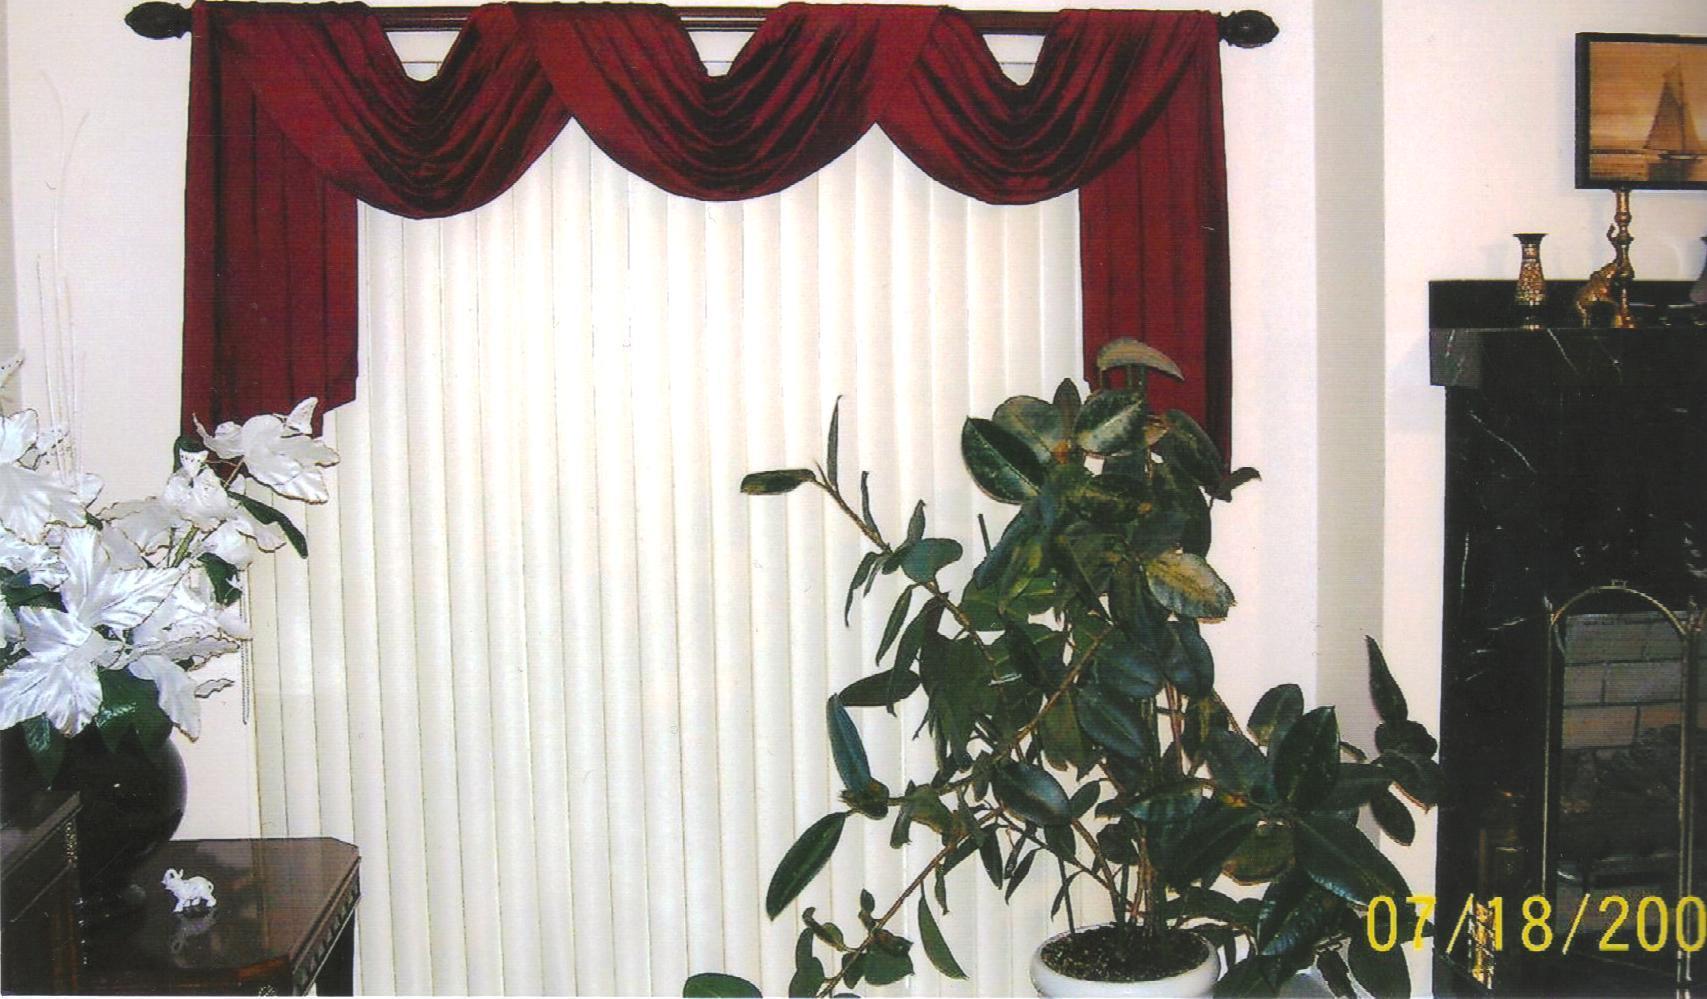 Window Works of Swansea image 4